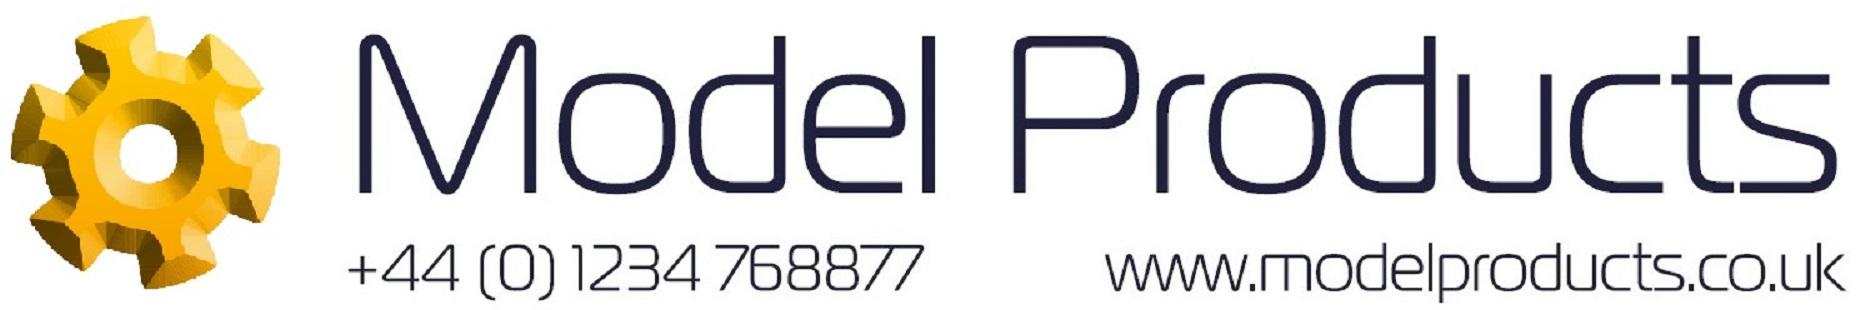 Model Products Ltd